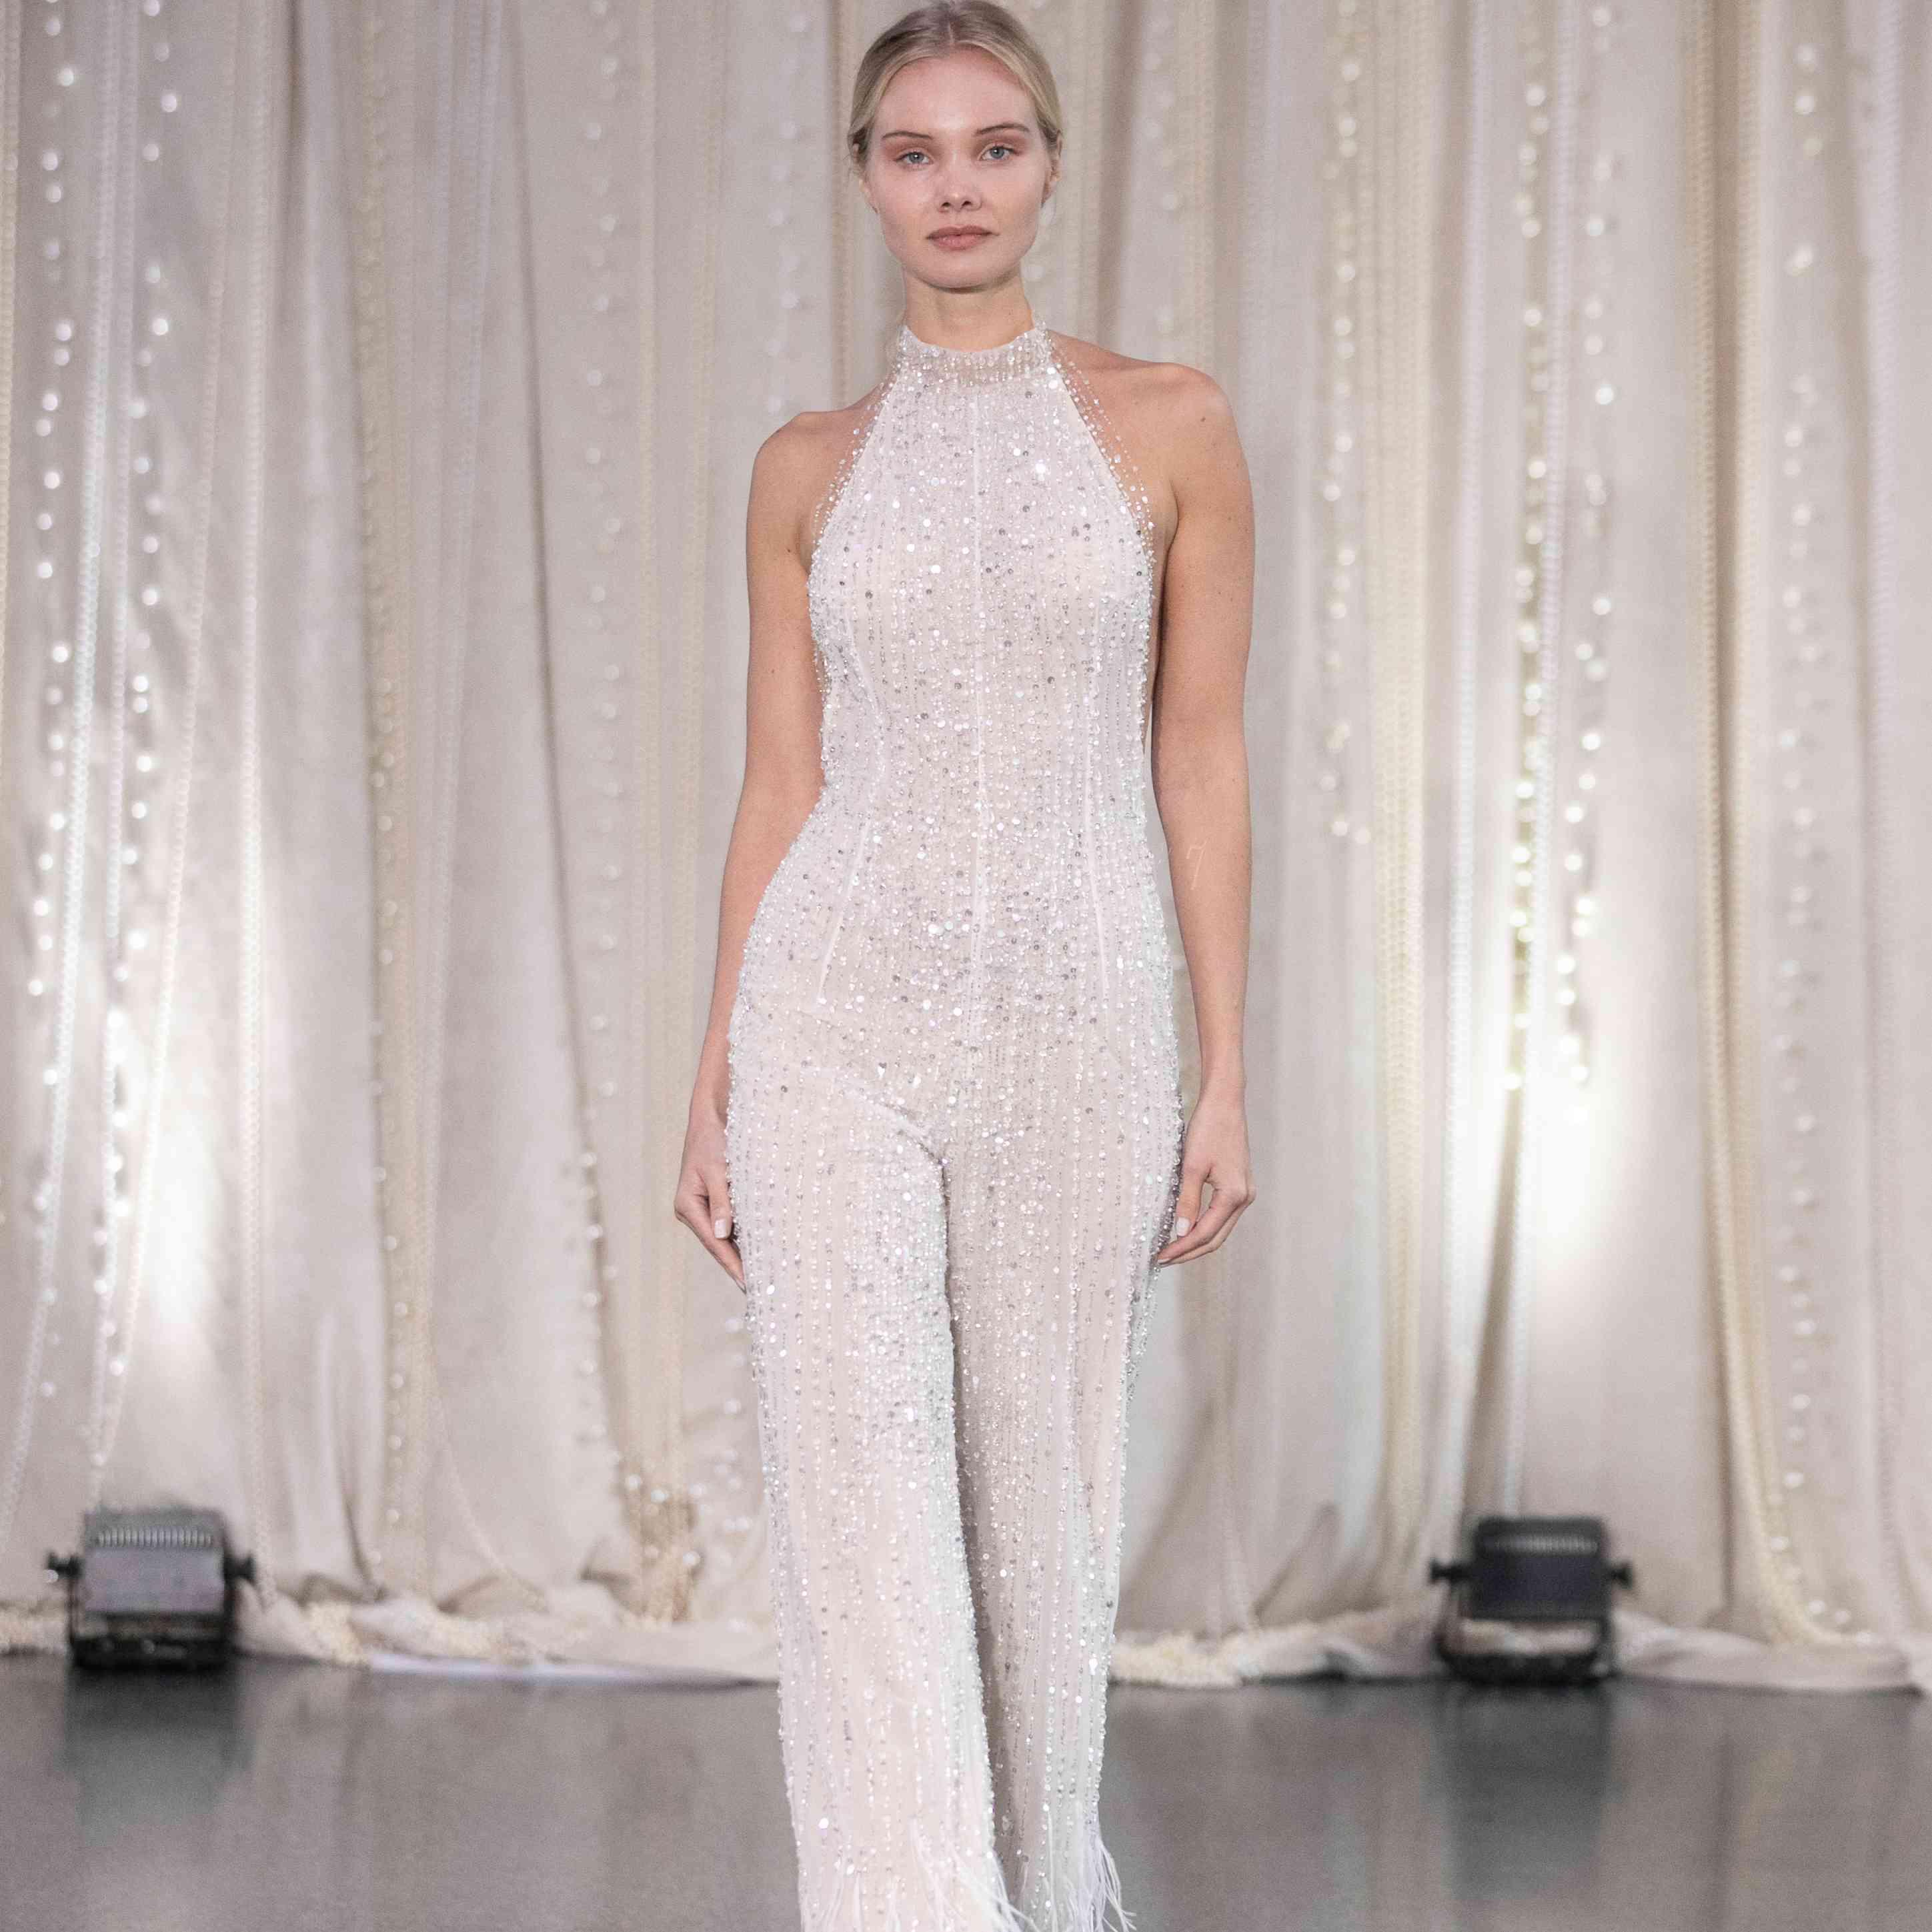 Model in high neck beaded wedding jumpsuit